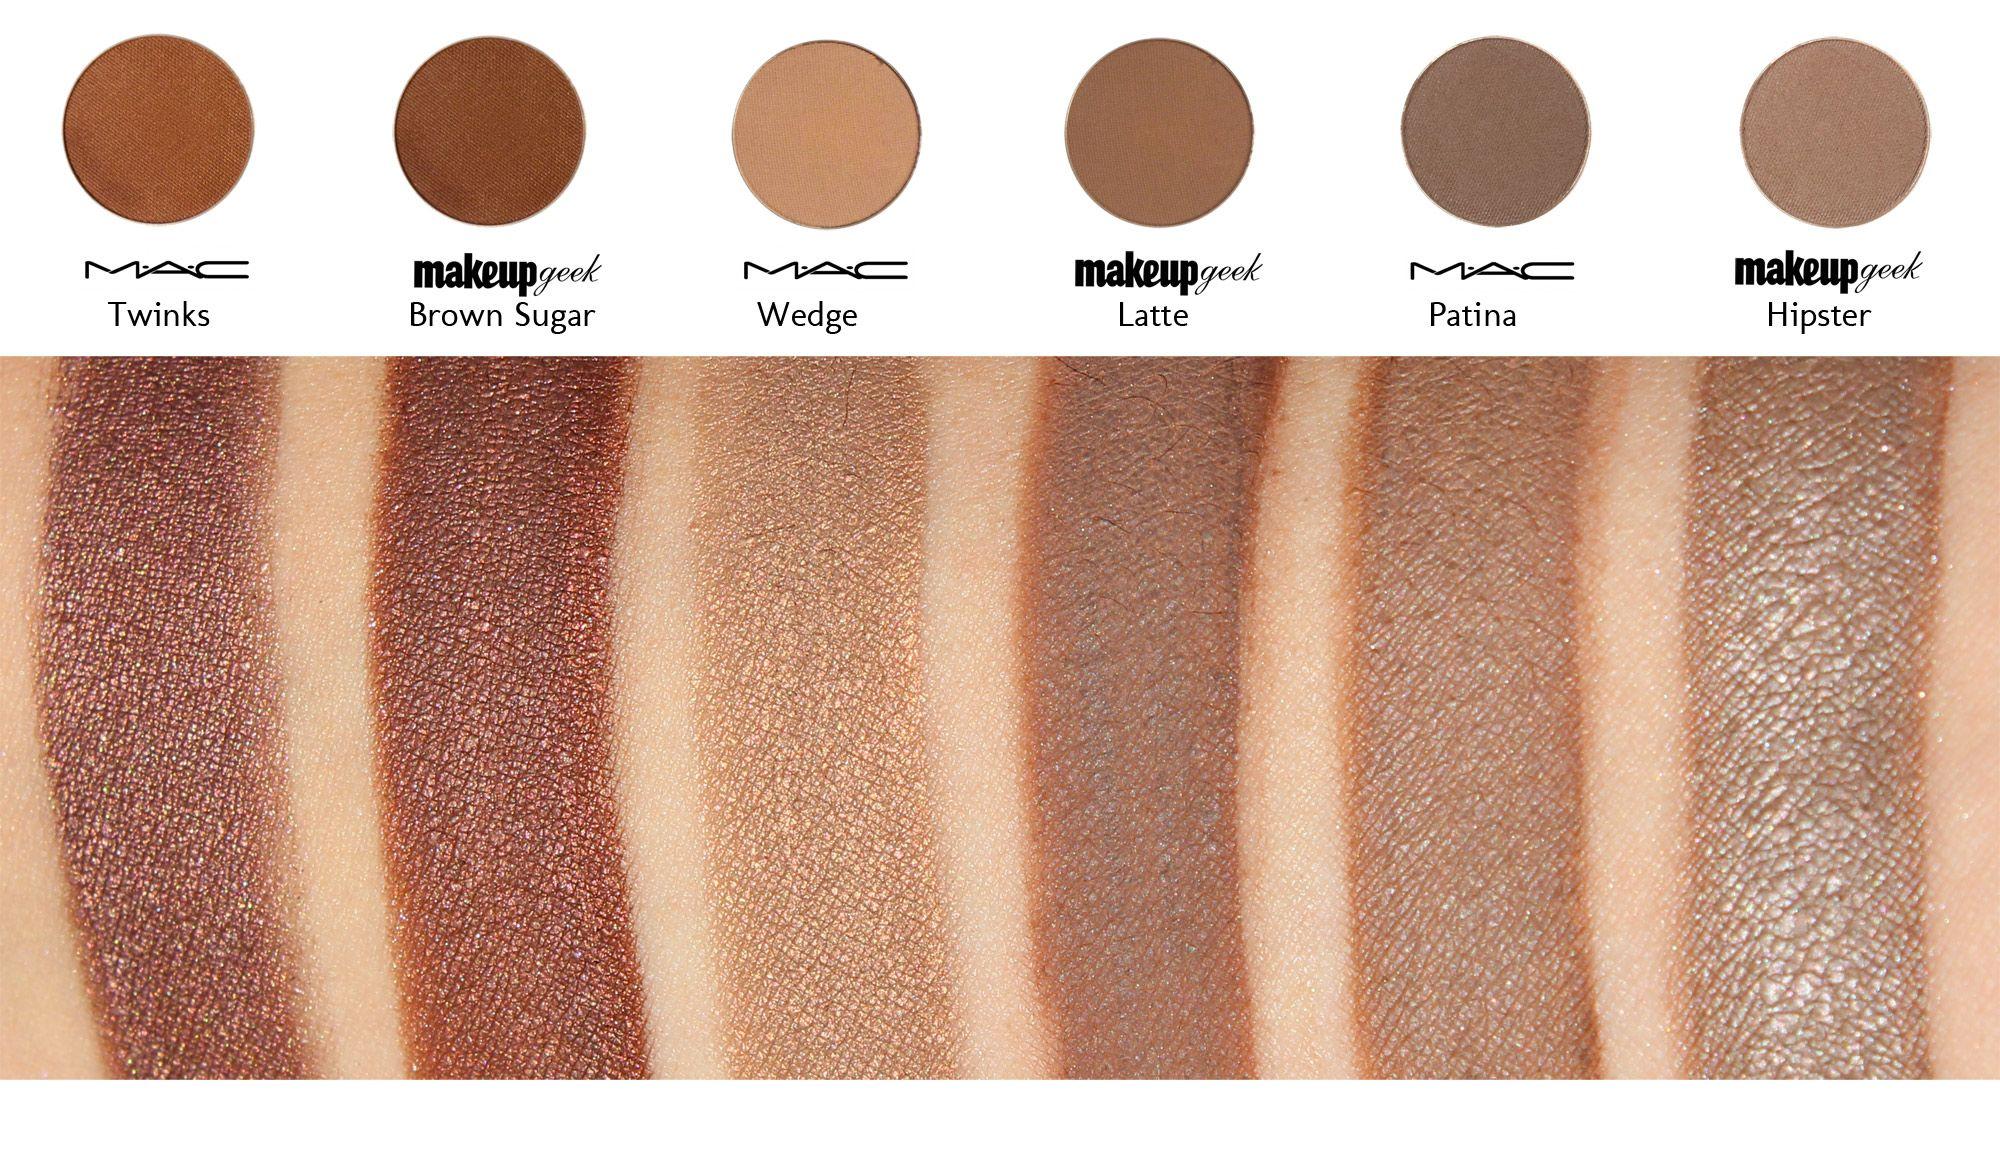 The List of MAC Dupes for Makeup Geek Eyeshadows Makeup